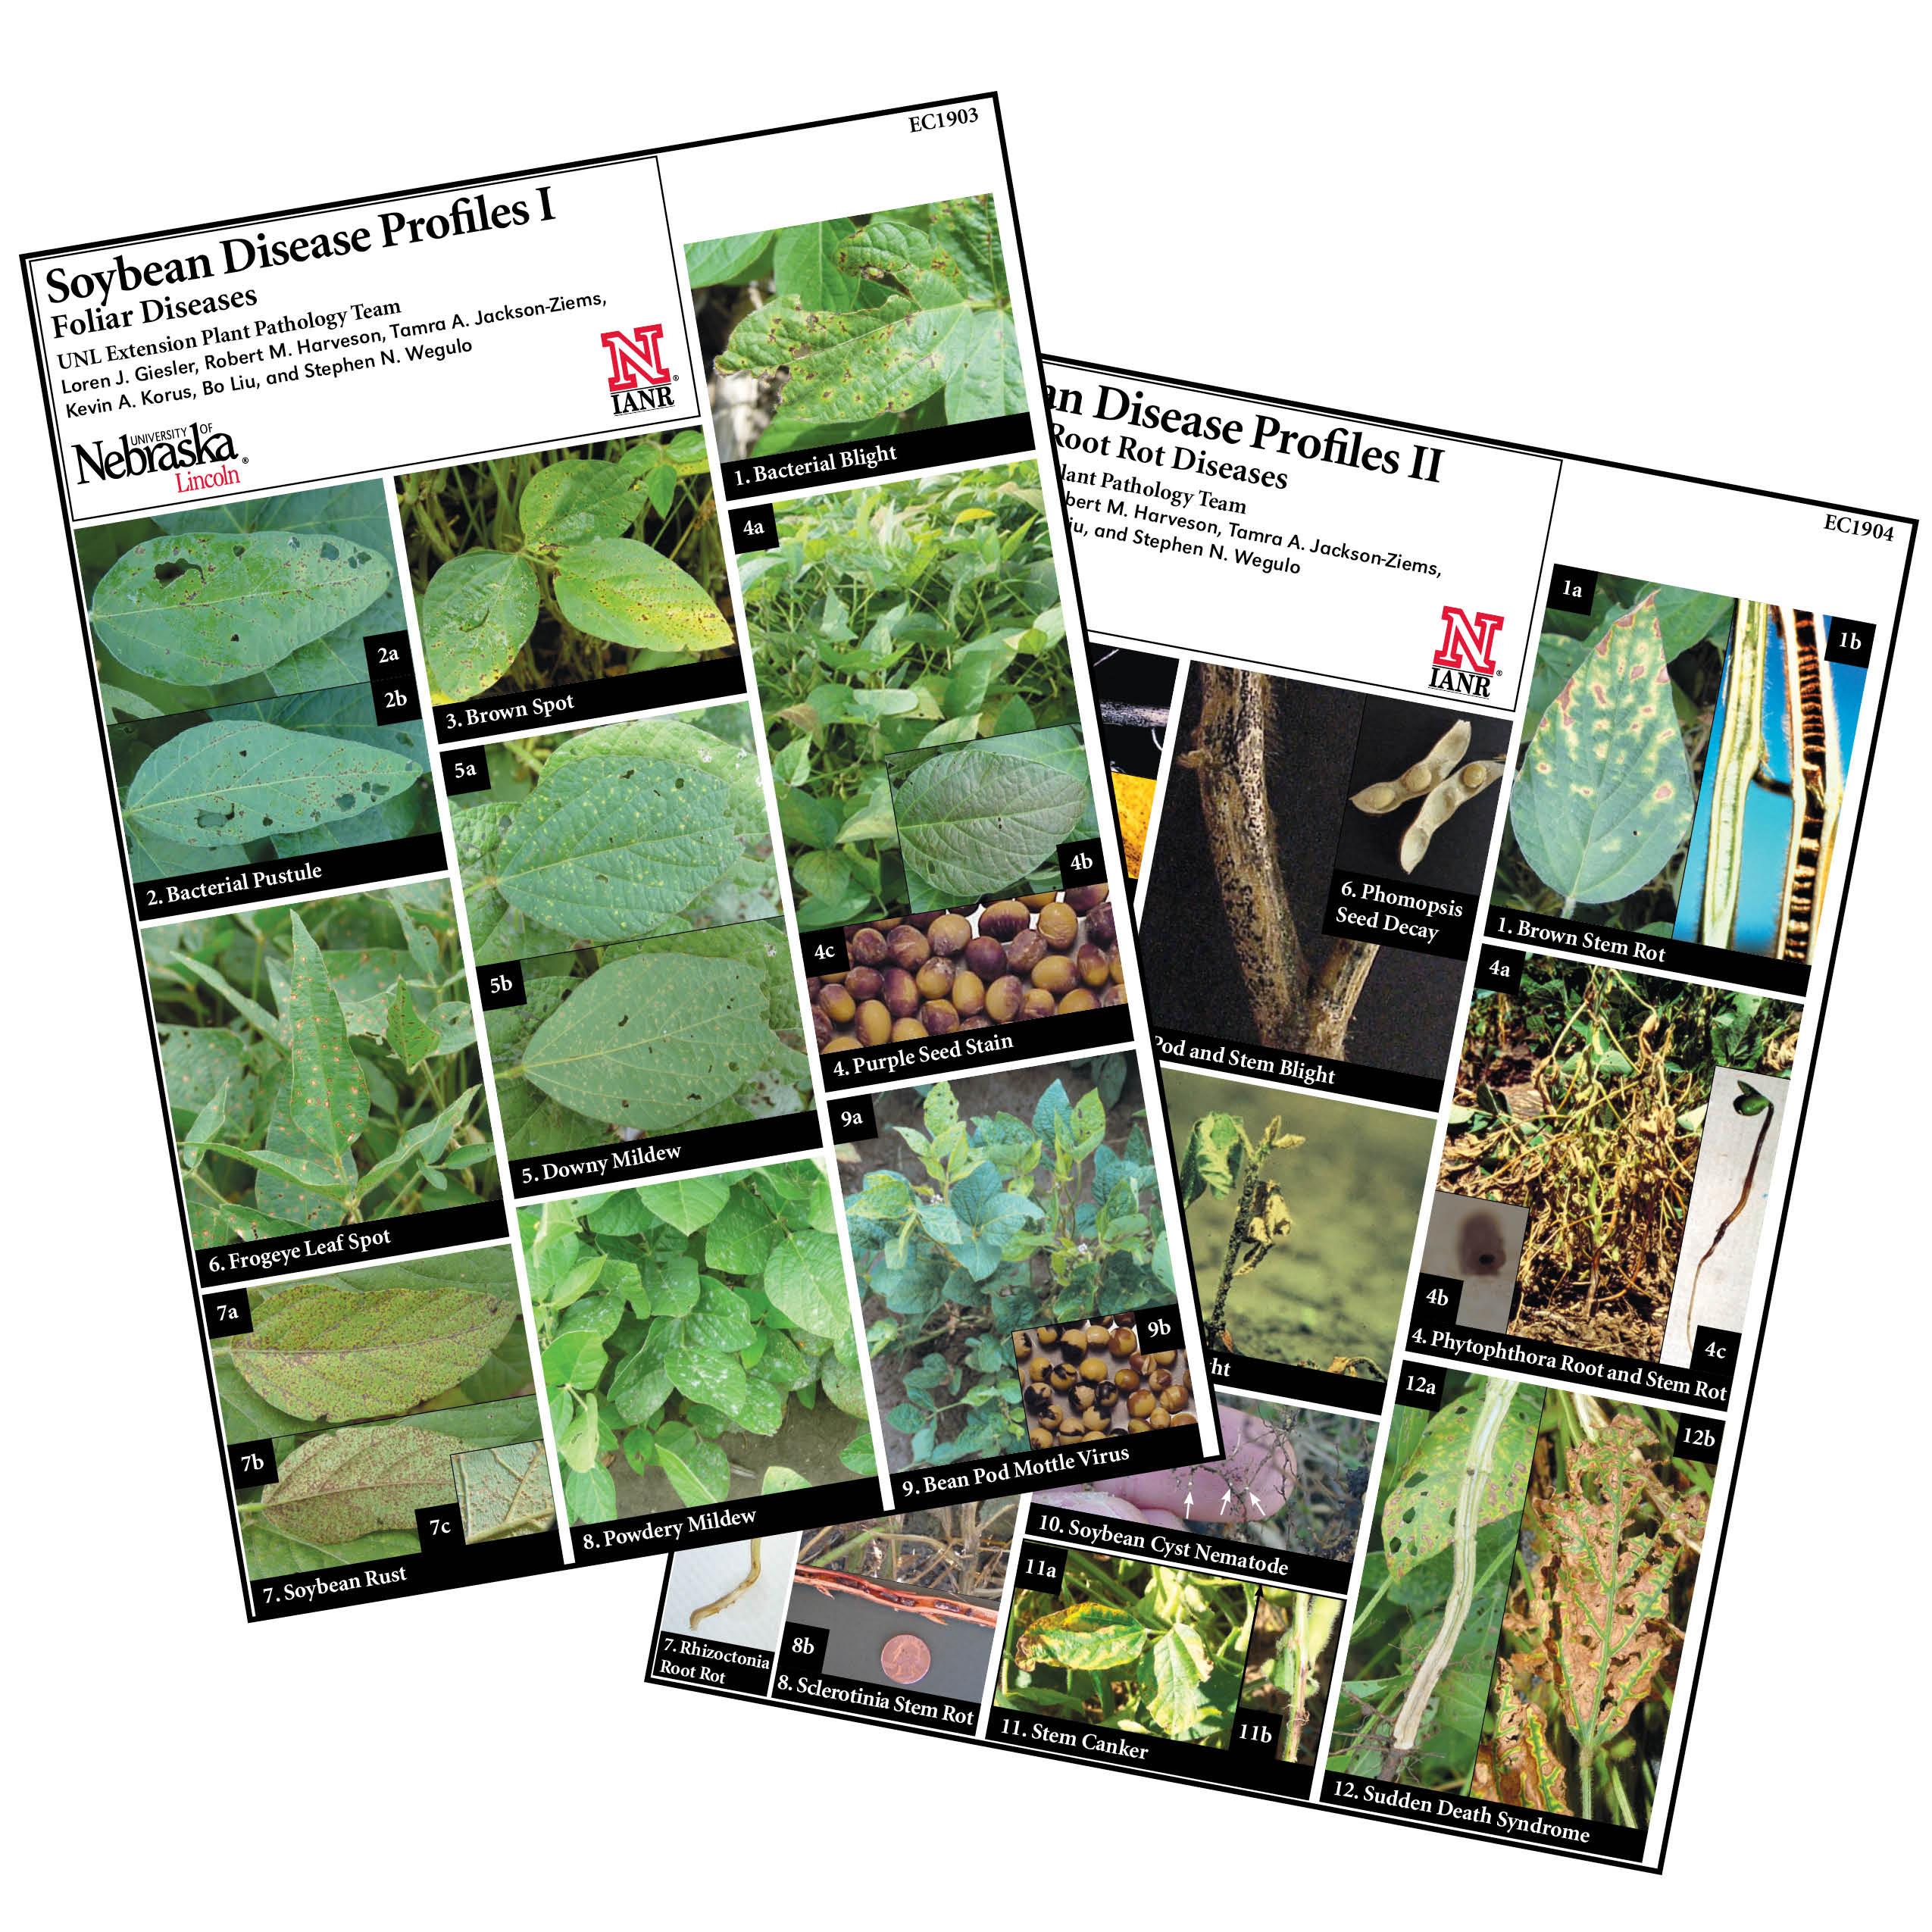 Soybean Disease Profiles